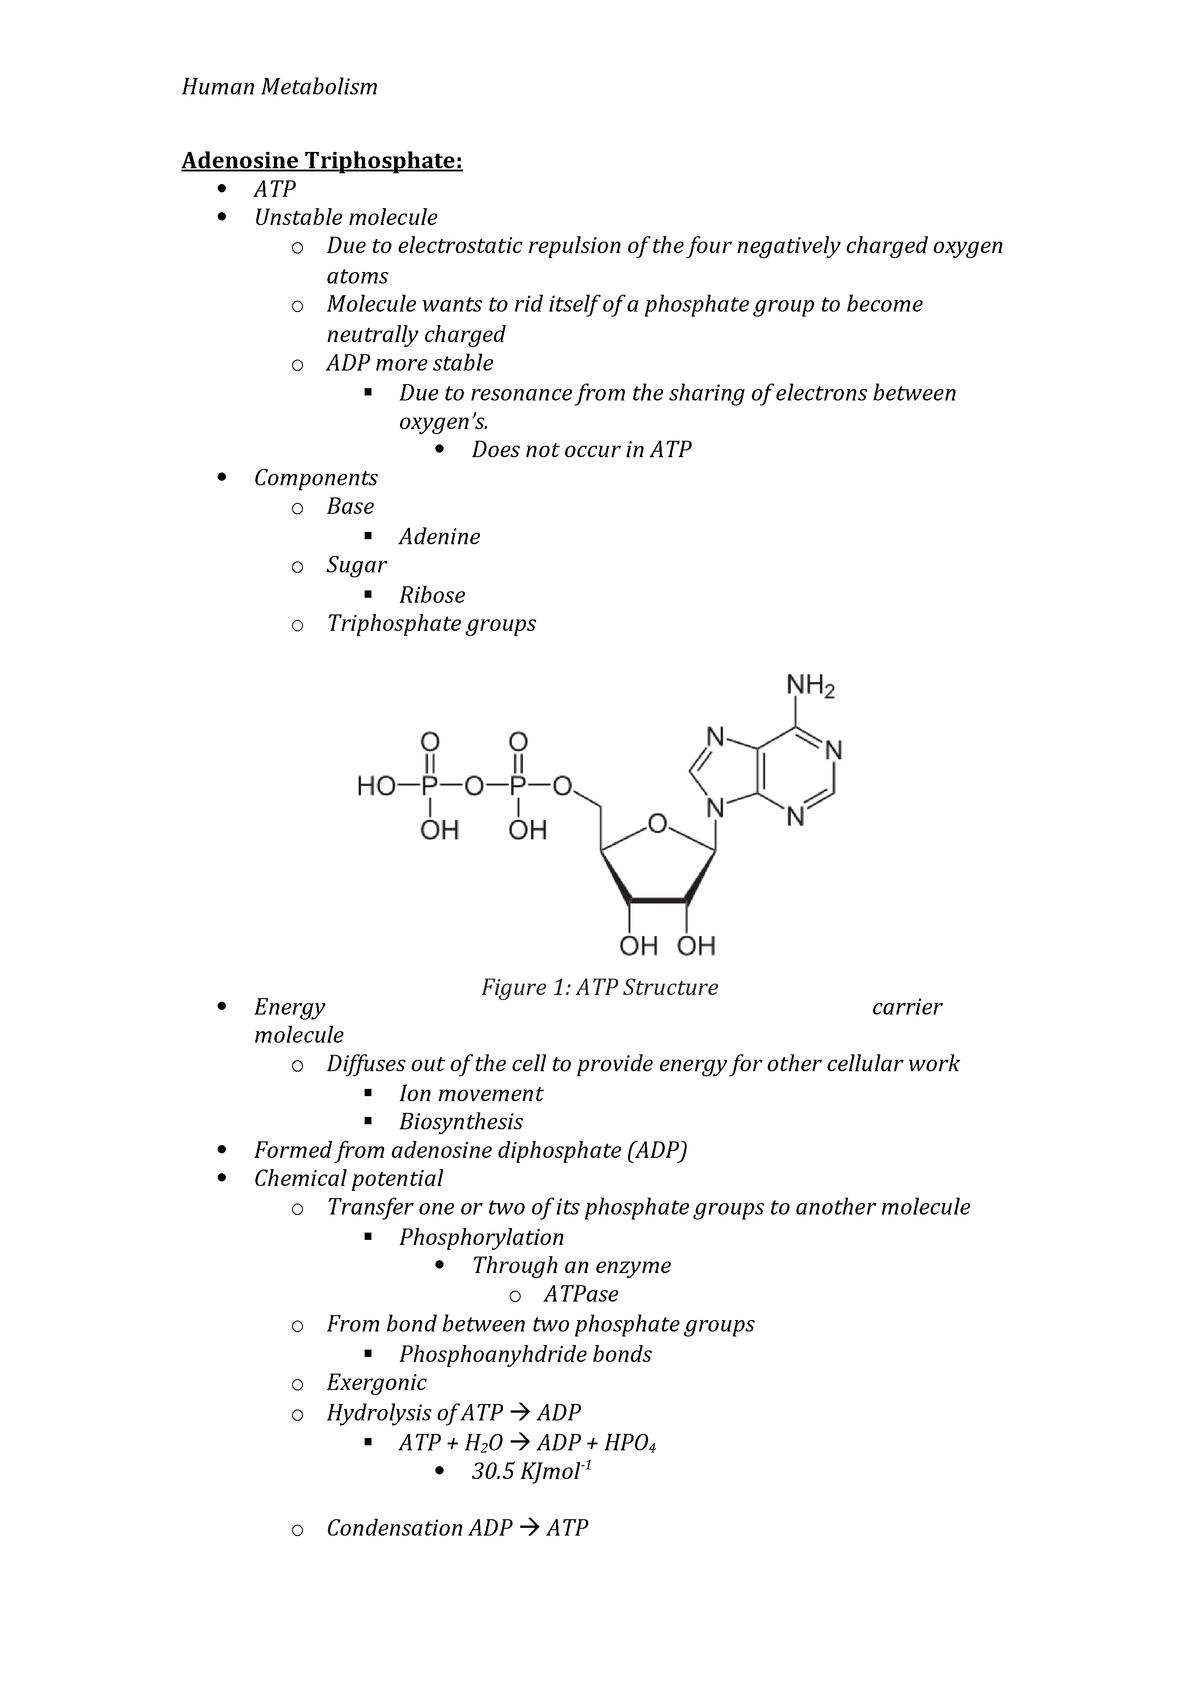 Adenosine Triphosphate Lecture Notes Human Metabolism Studocu